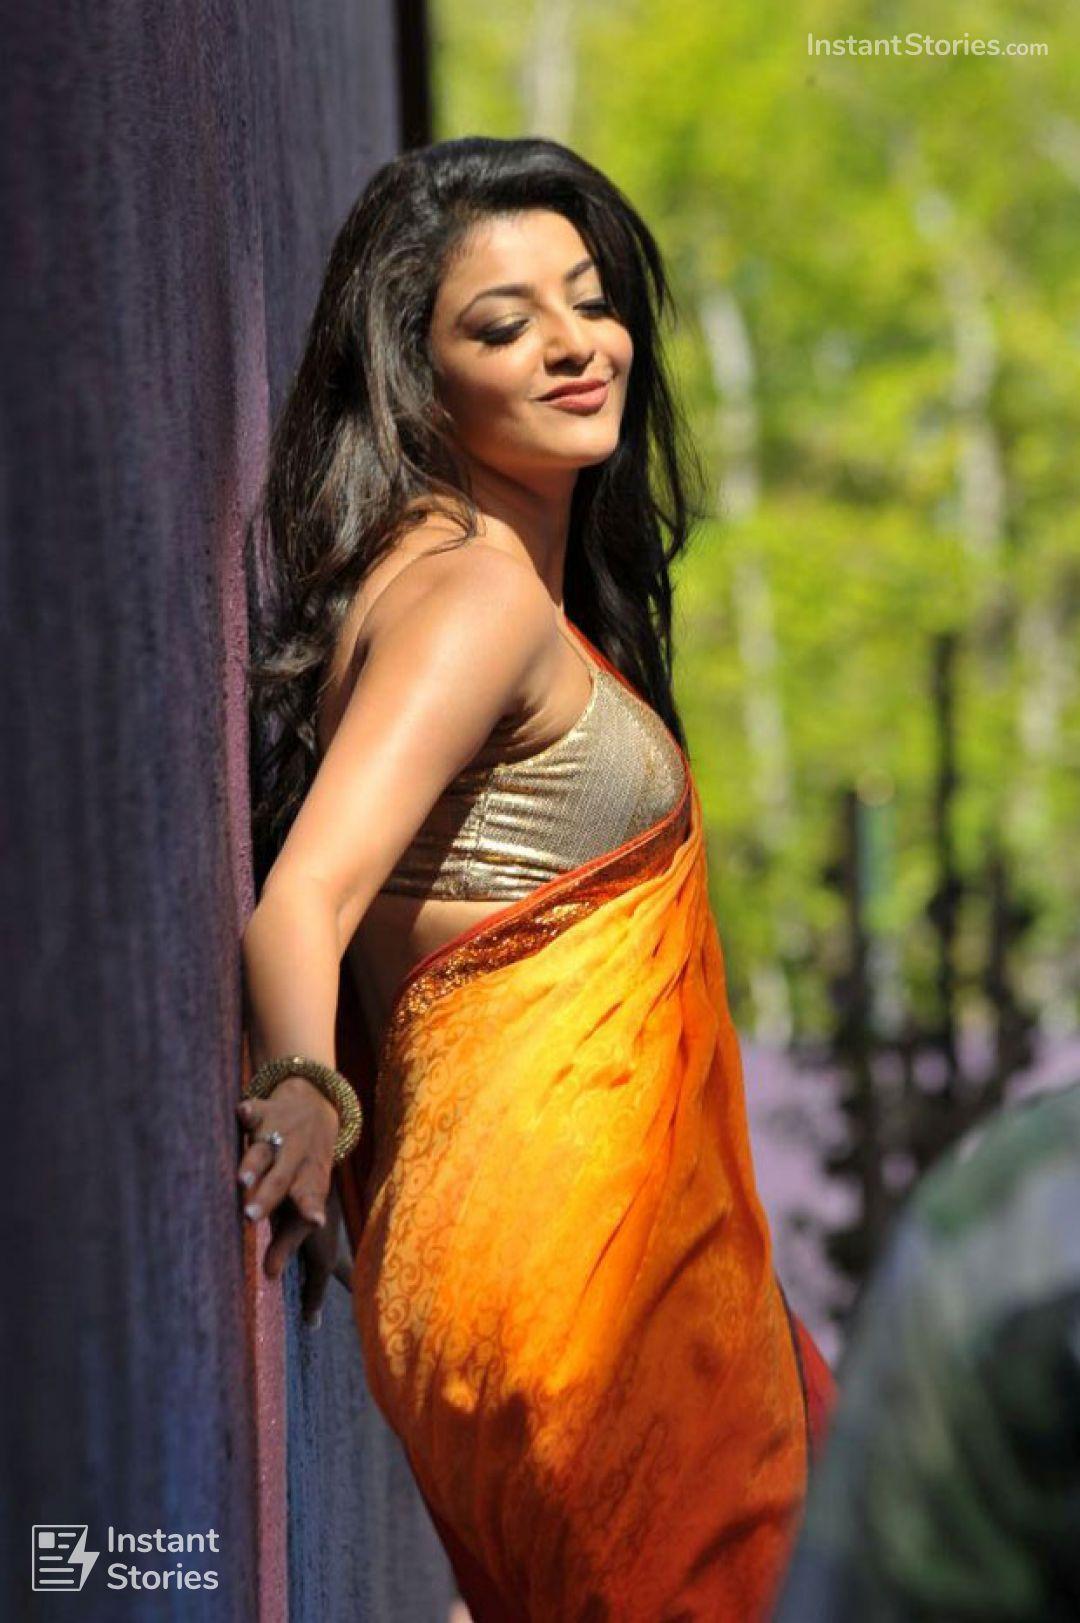 Kajal Aggarwal Latest Hot Hd Images 1080p 1082 Kajalaggarwal Beautiful Indian Actress Most Beautiful Indian Actress Beautiful Bollywood Actress